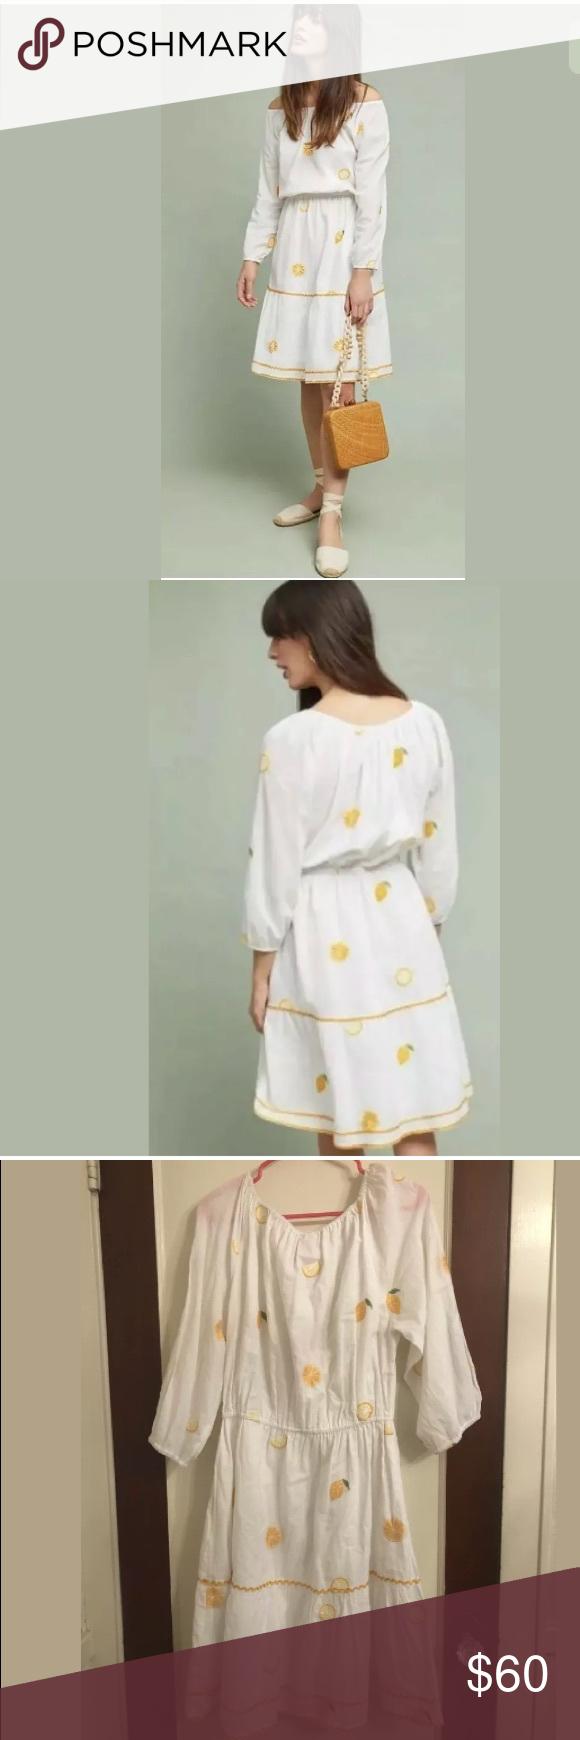 Anthropologie Nimo With Love White Lemon Dress Xl Anthropologie Nimo With Love White Lemon Dress Size Xl Nwot Line Th Lemon Dress Xl Dress Anthropologie Dress [ 1740 x 580 Pixel ]